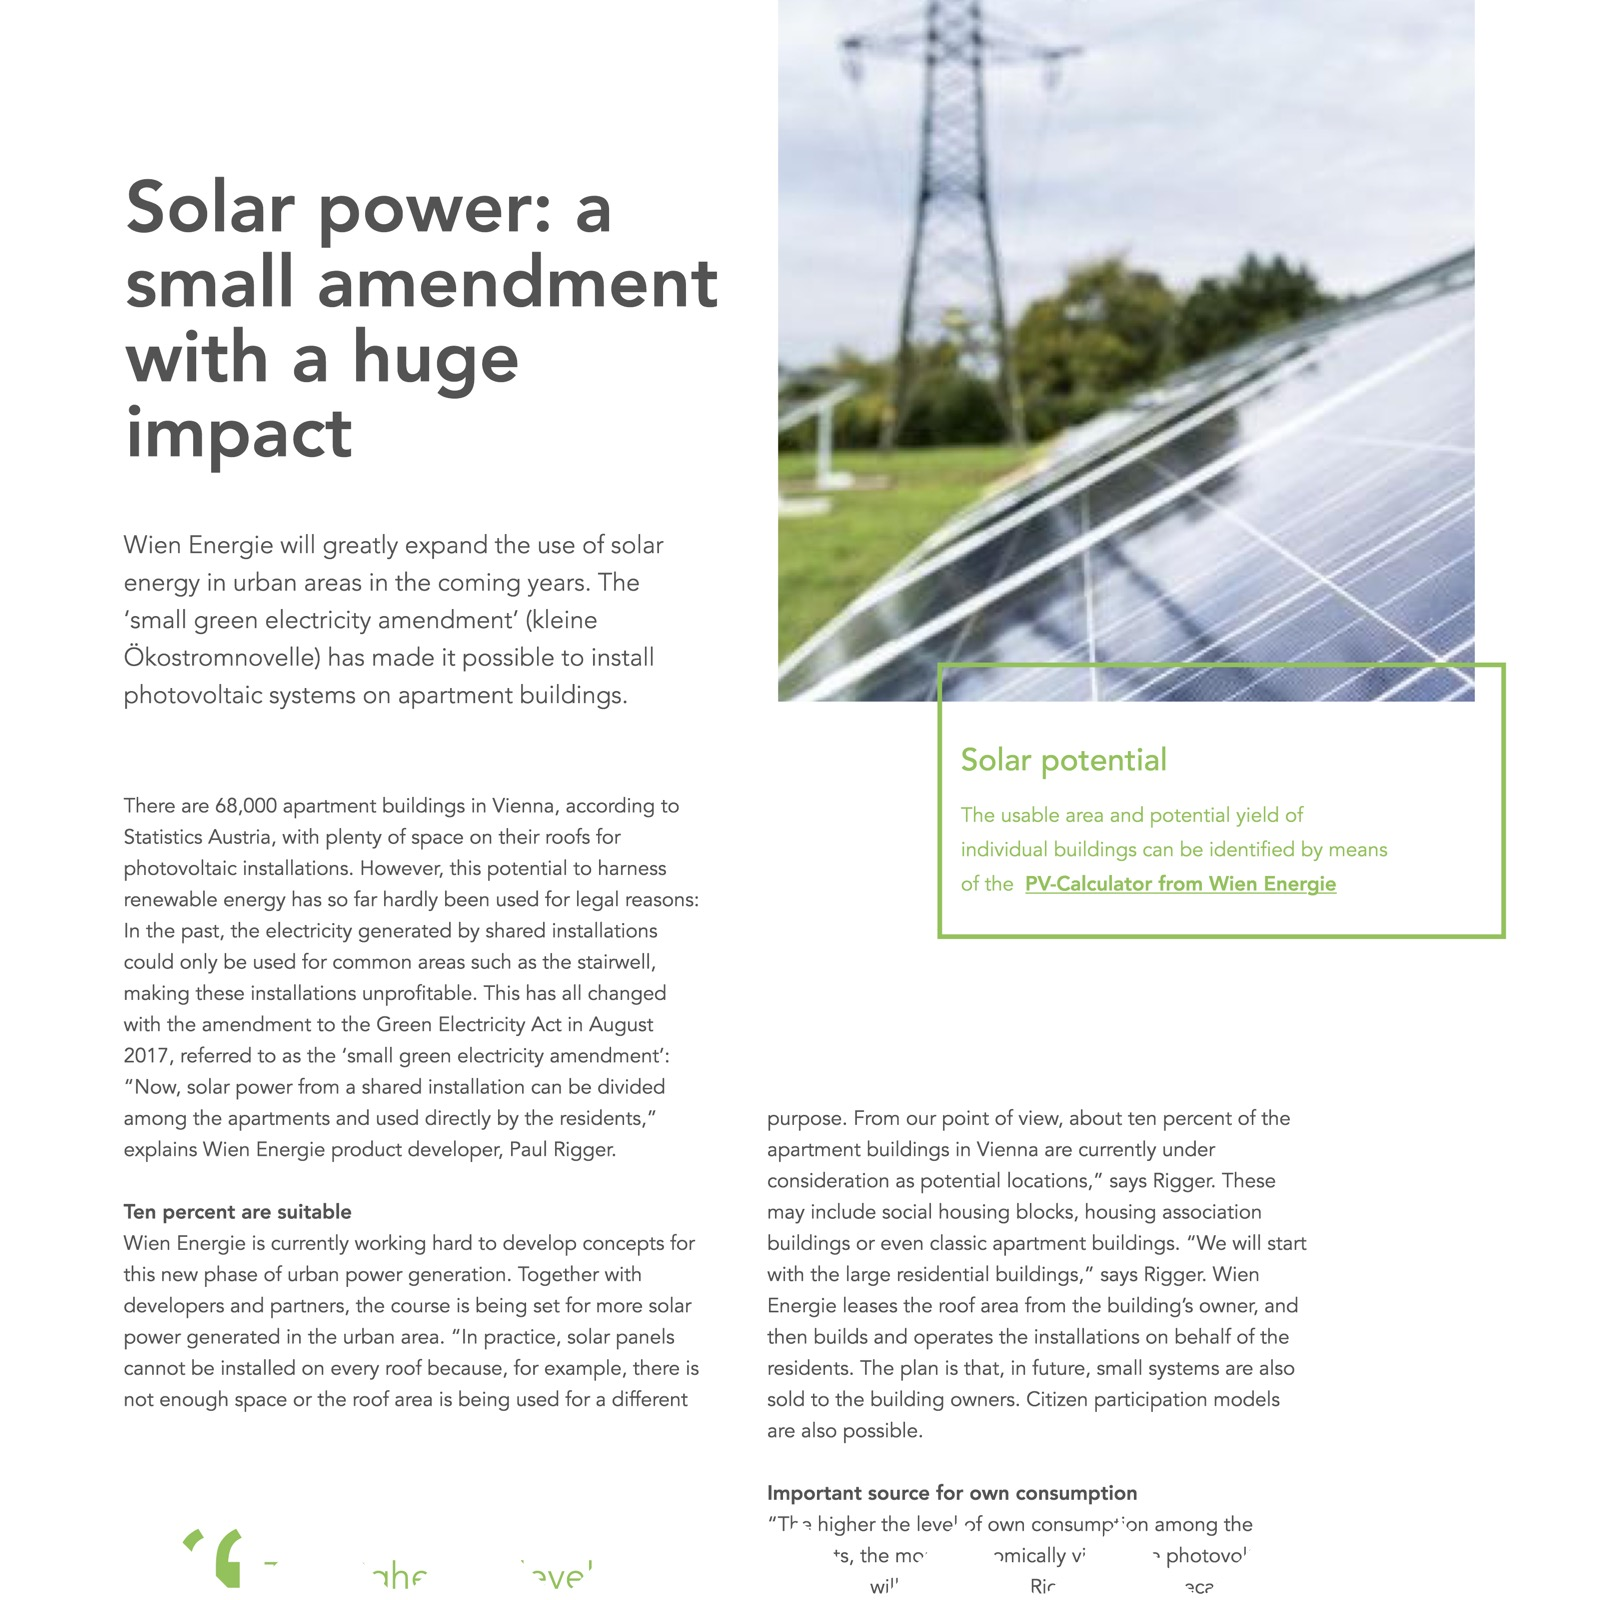 Solar power: a small amendment with a huge impact – Wien